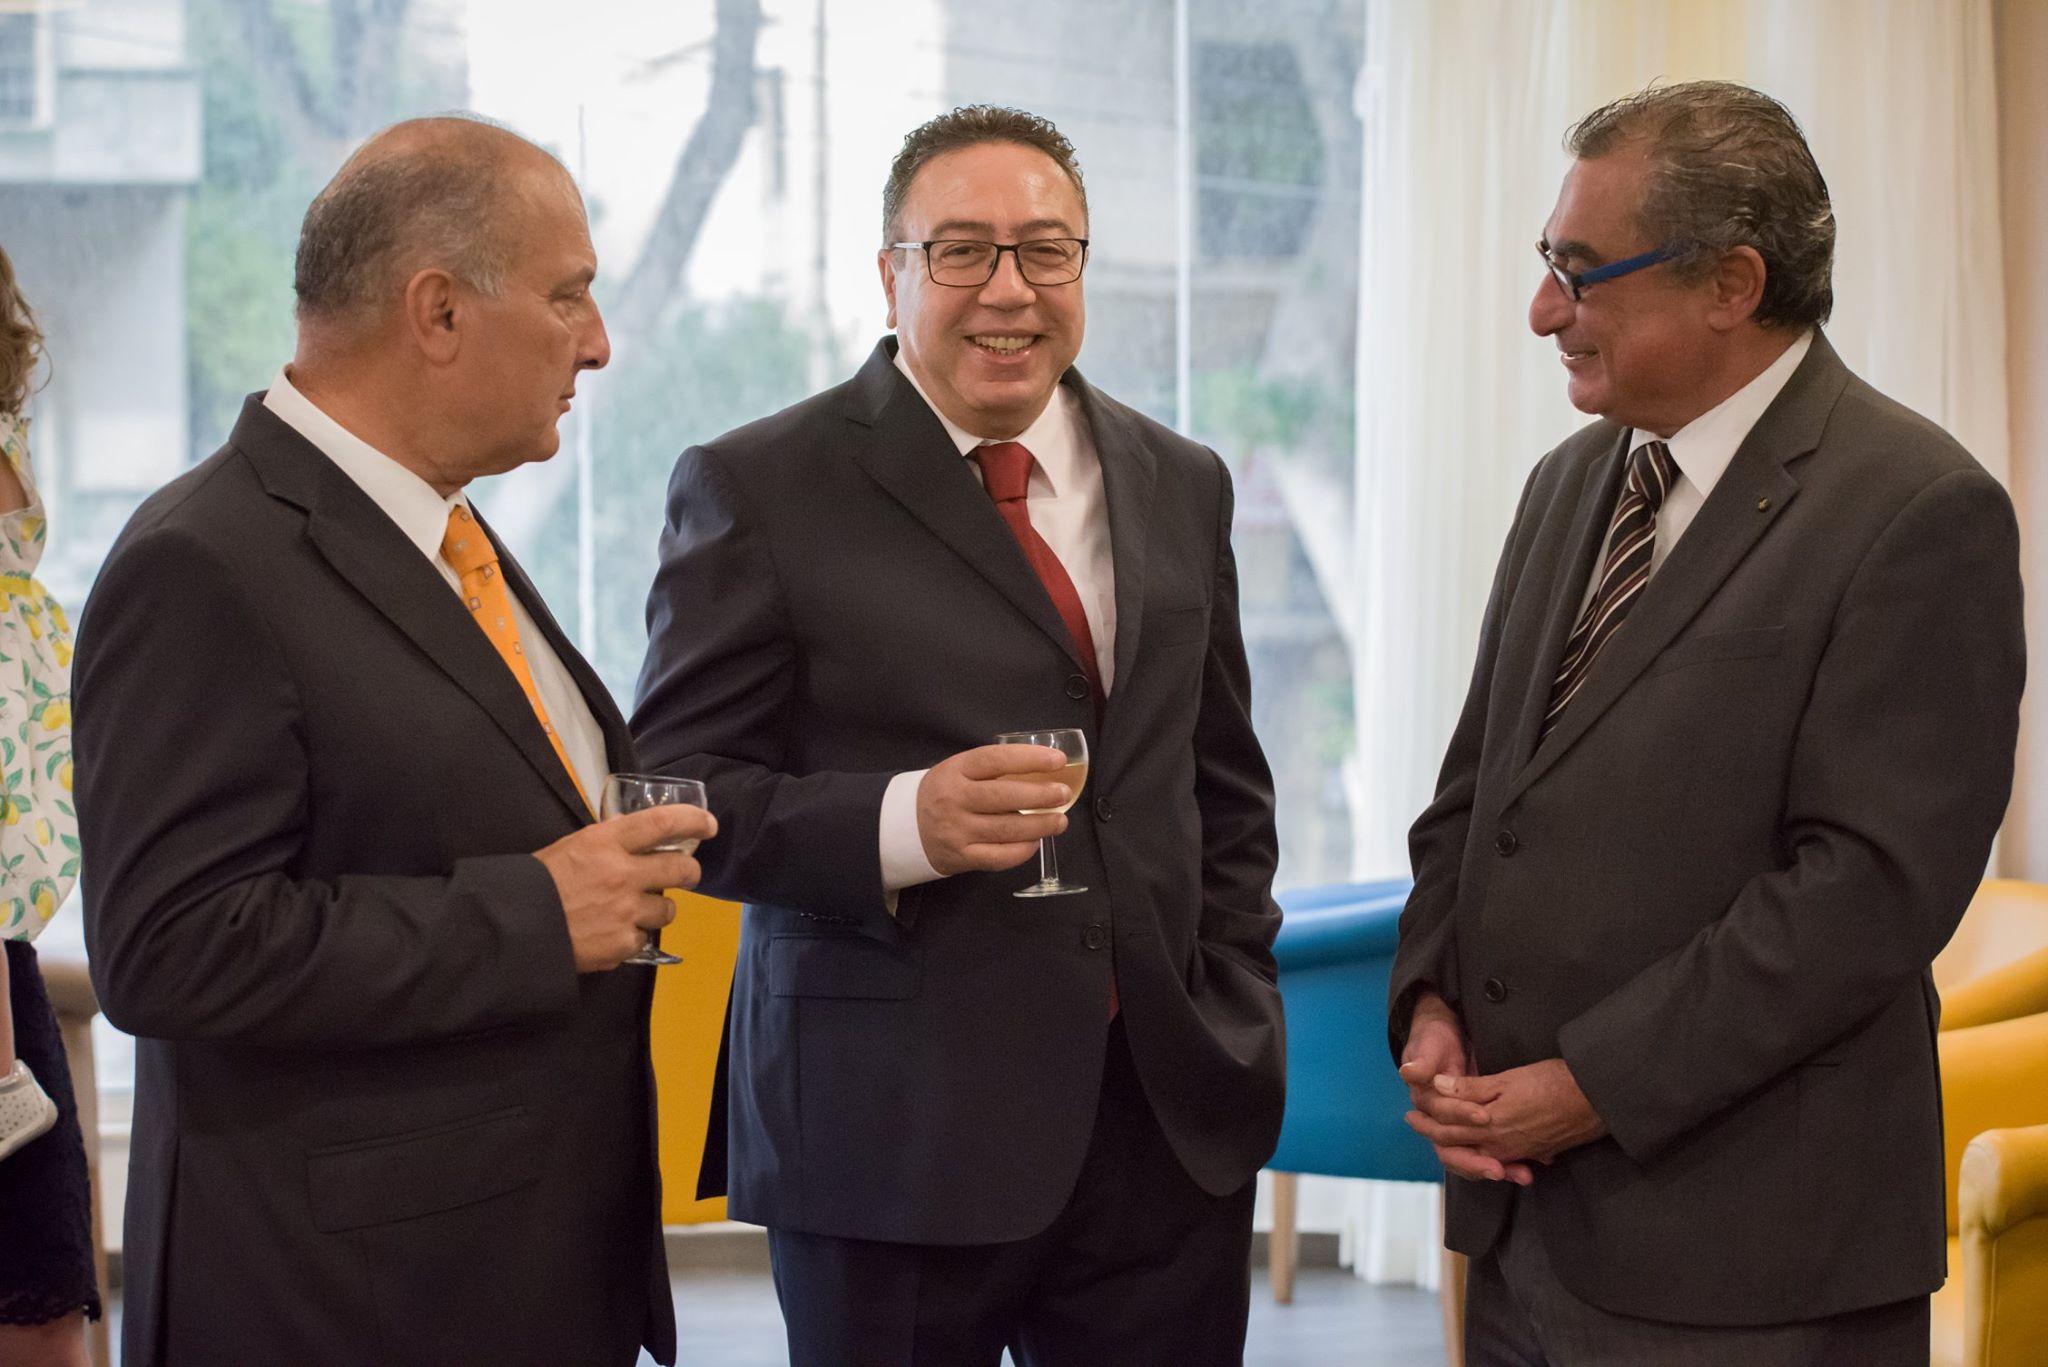 Hasil gambar untuk Tunisian Ambassador Zyed Bouzouita: